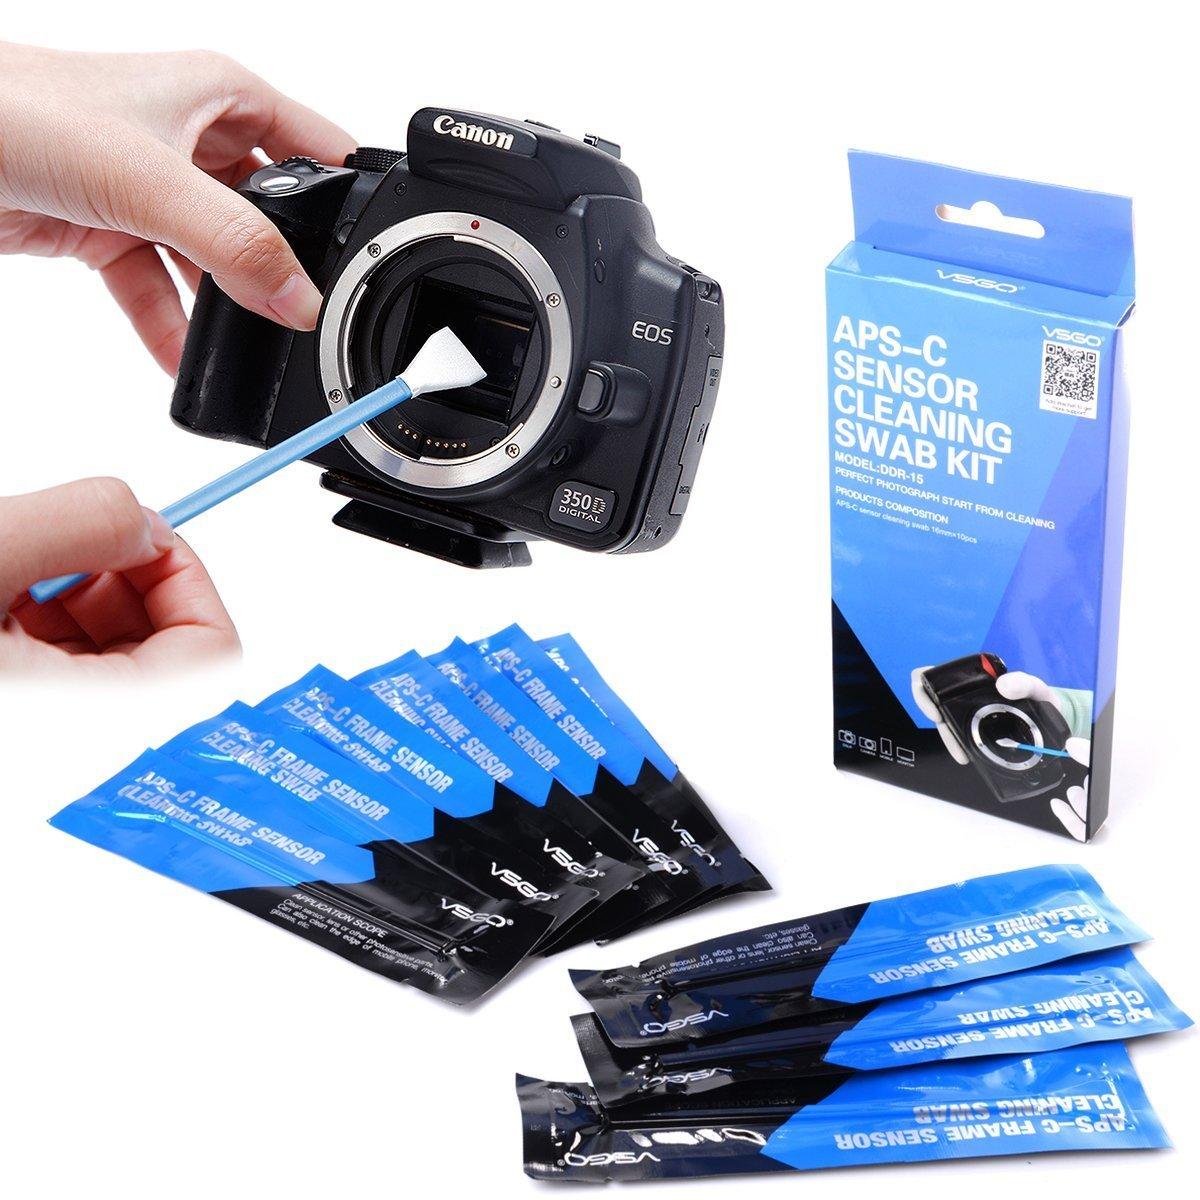 VSGO APS-C Frame (CCD/CMOS) Digital Camera Sensor Cleaning Kits (15 x 16mm Sensor Cleaning Swabs + 15ml Sensor Cleaner), Black (DDR-16S) Universal Electrical Supply Ltd VSGO DDR-16S